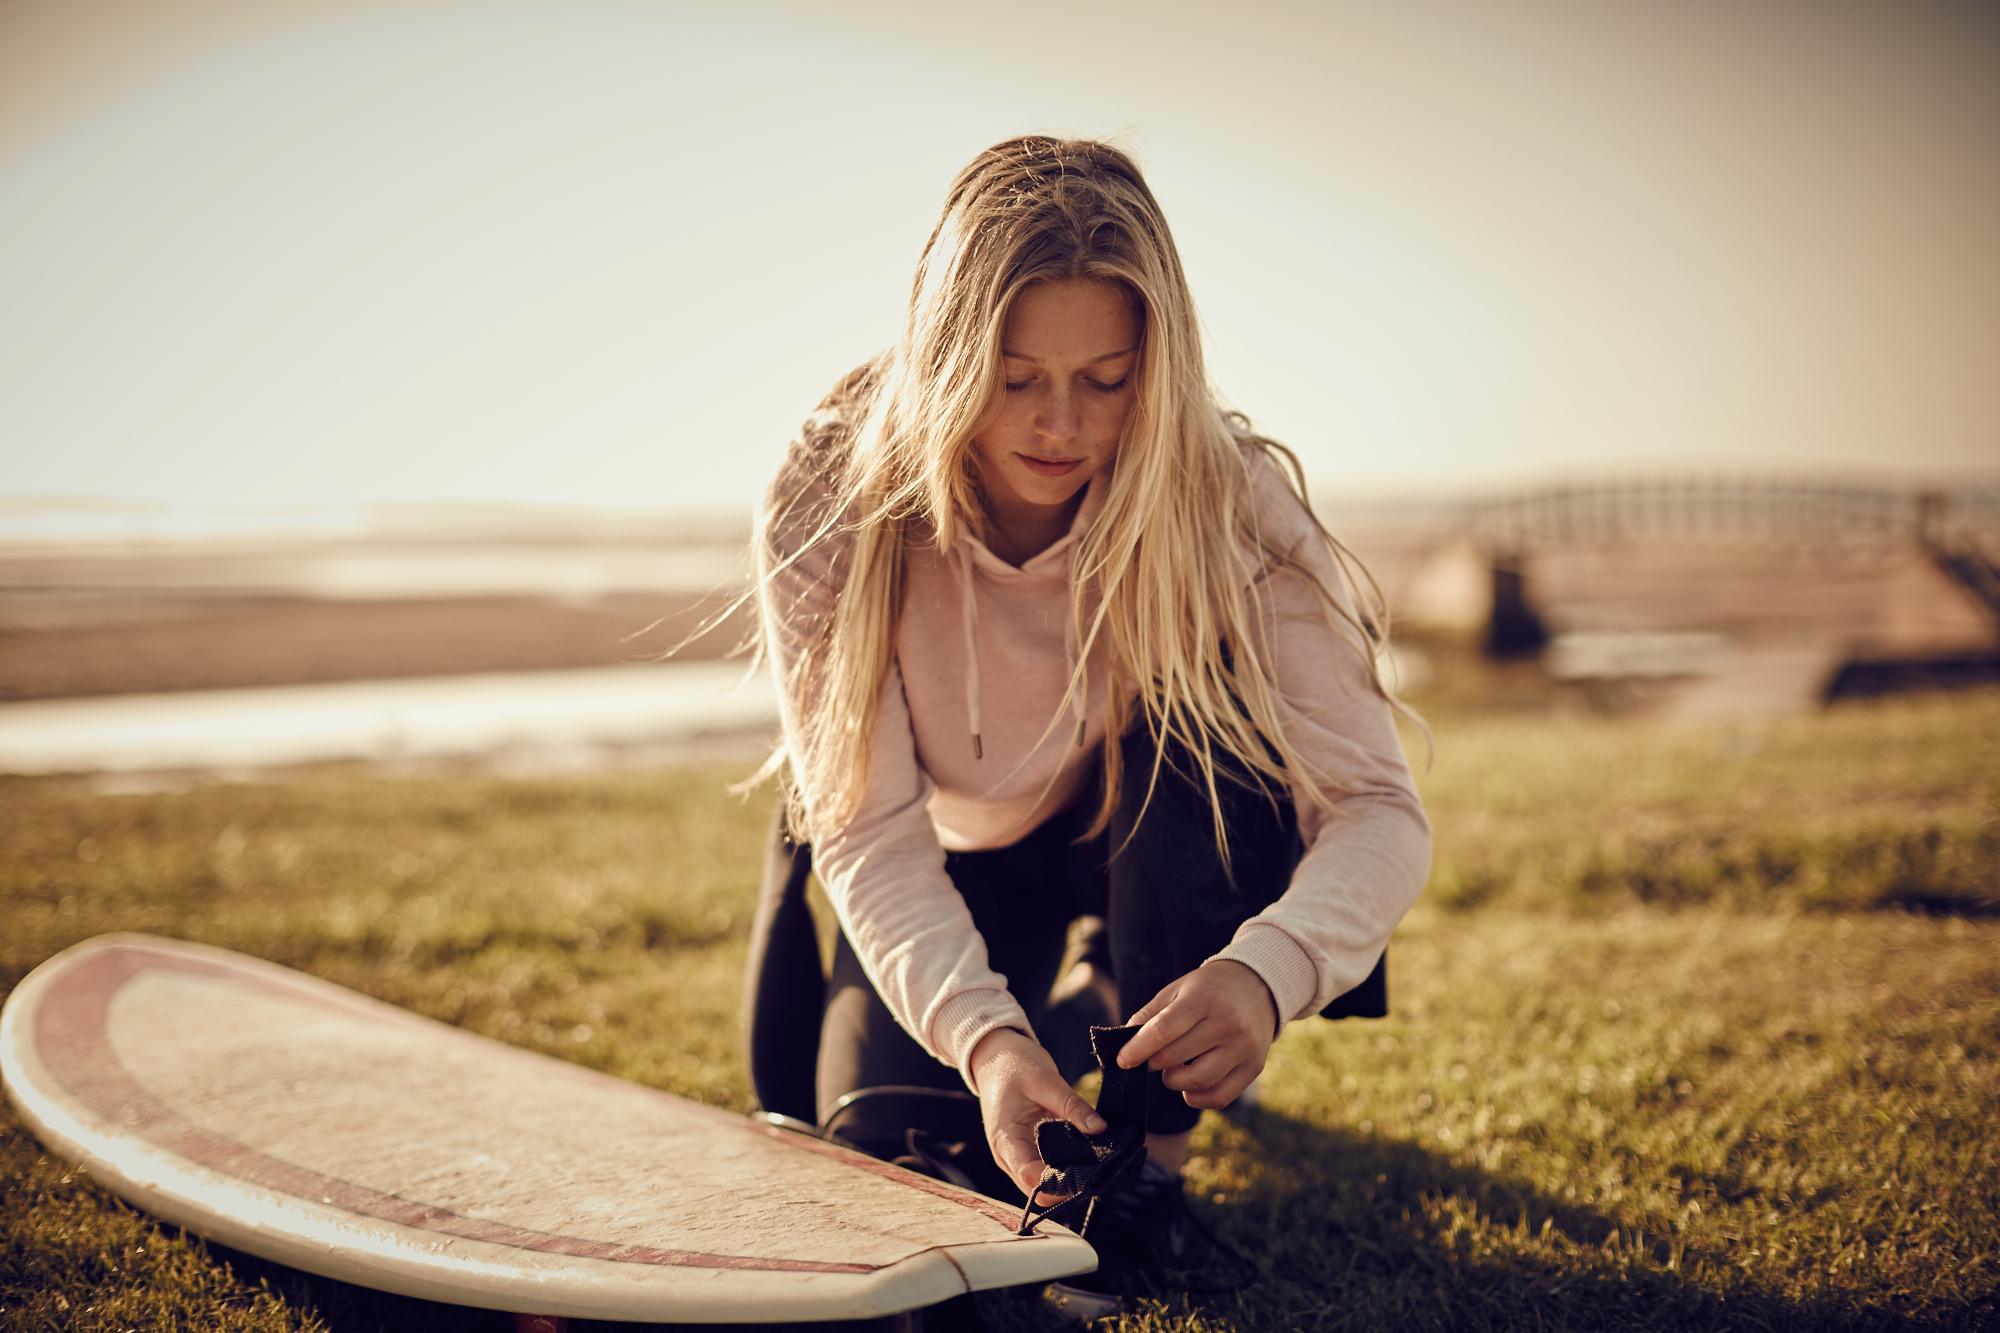 surf lyfestyle 050.jpg